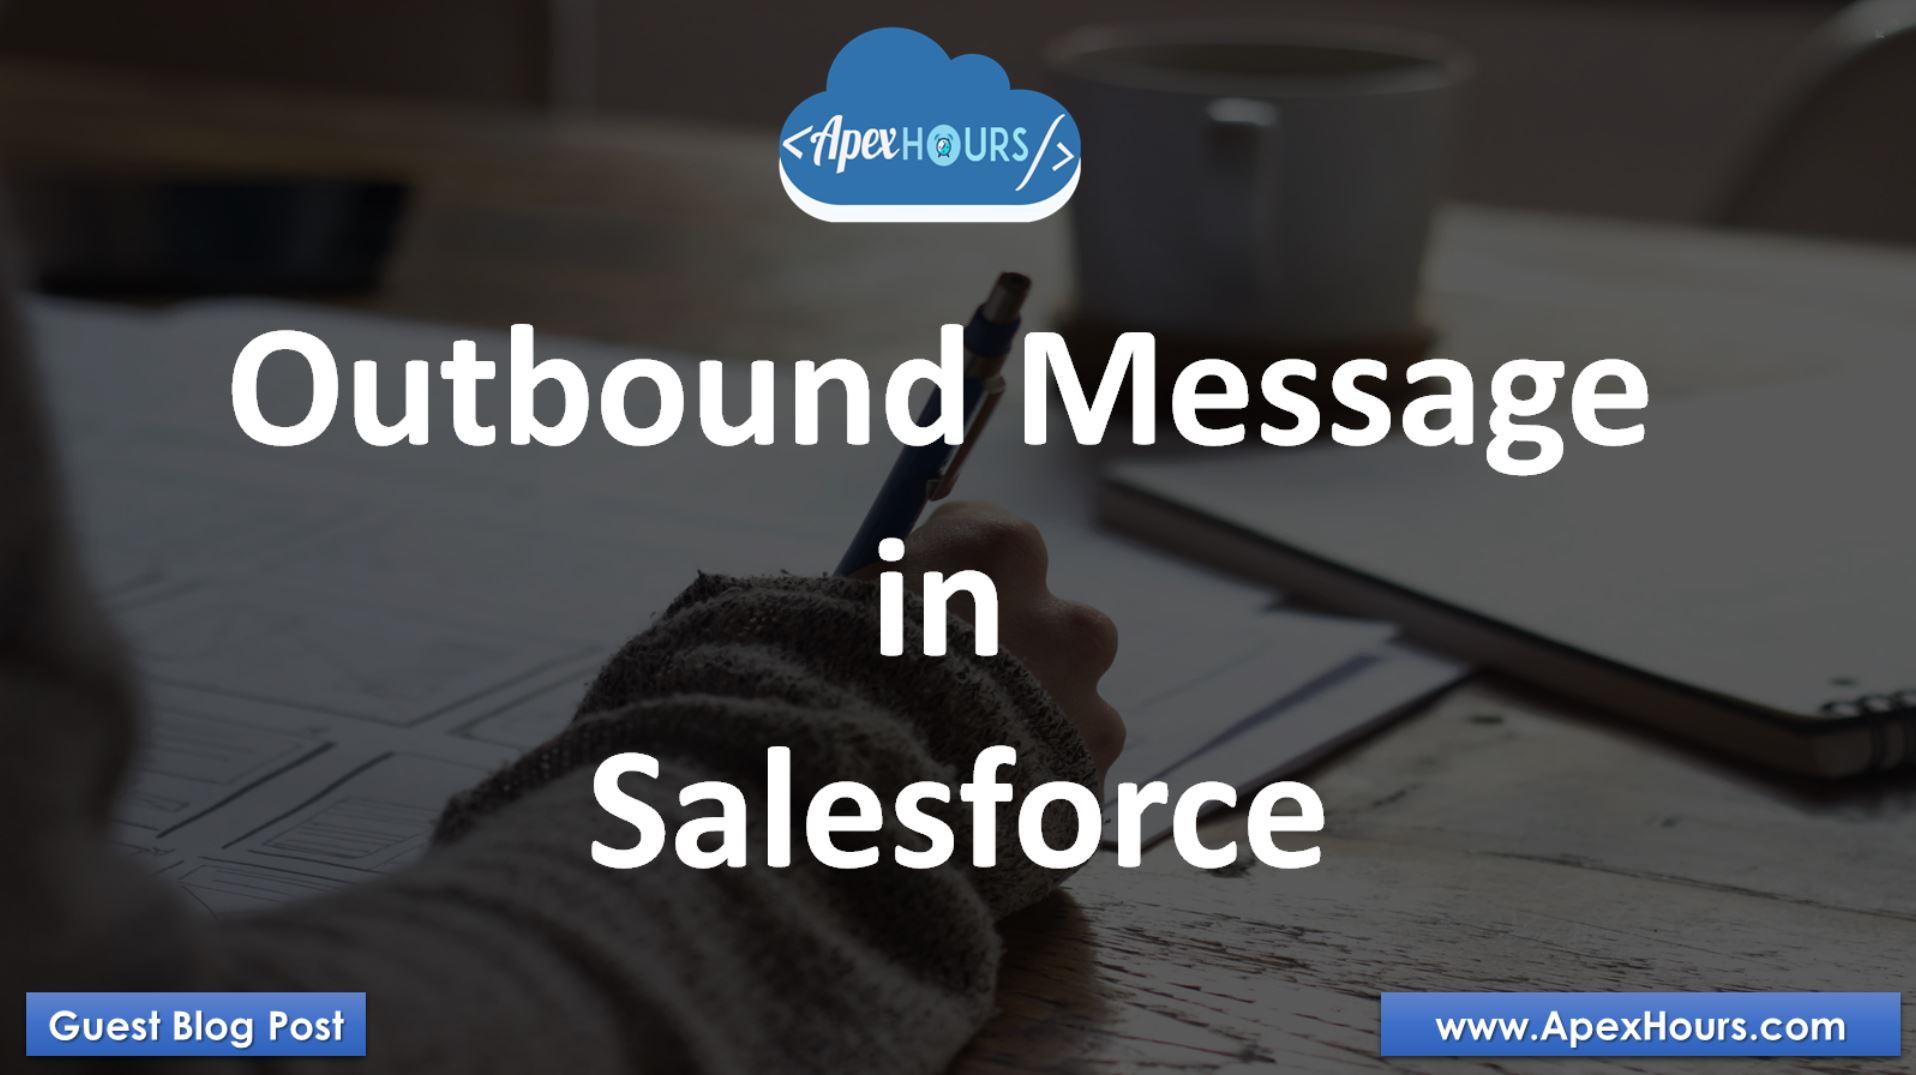 outbound Message in Salesforce